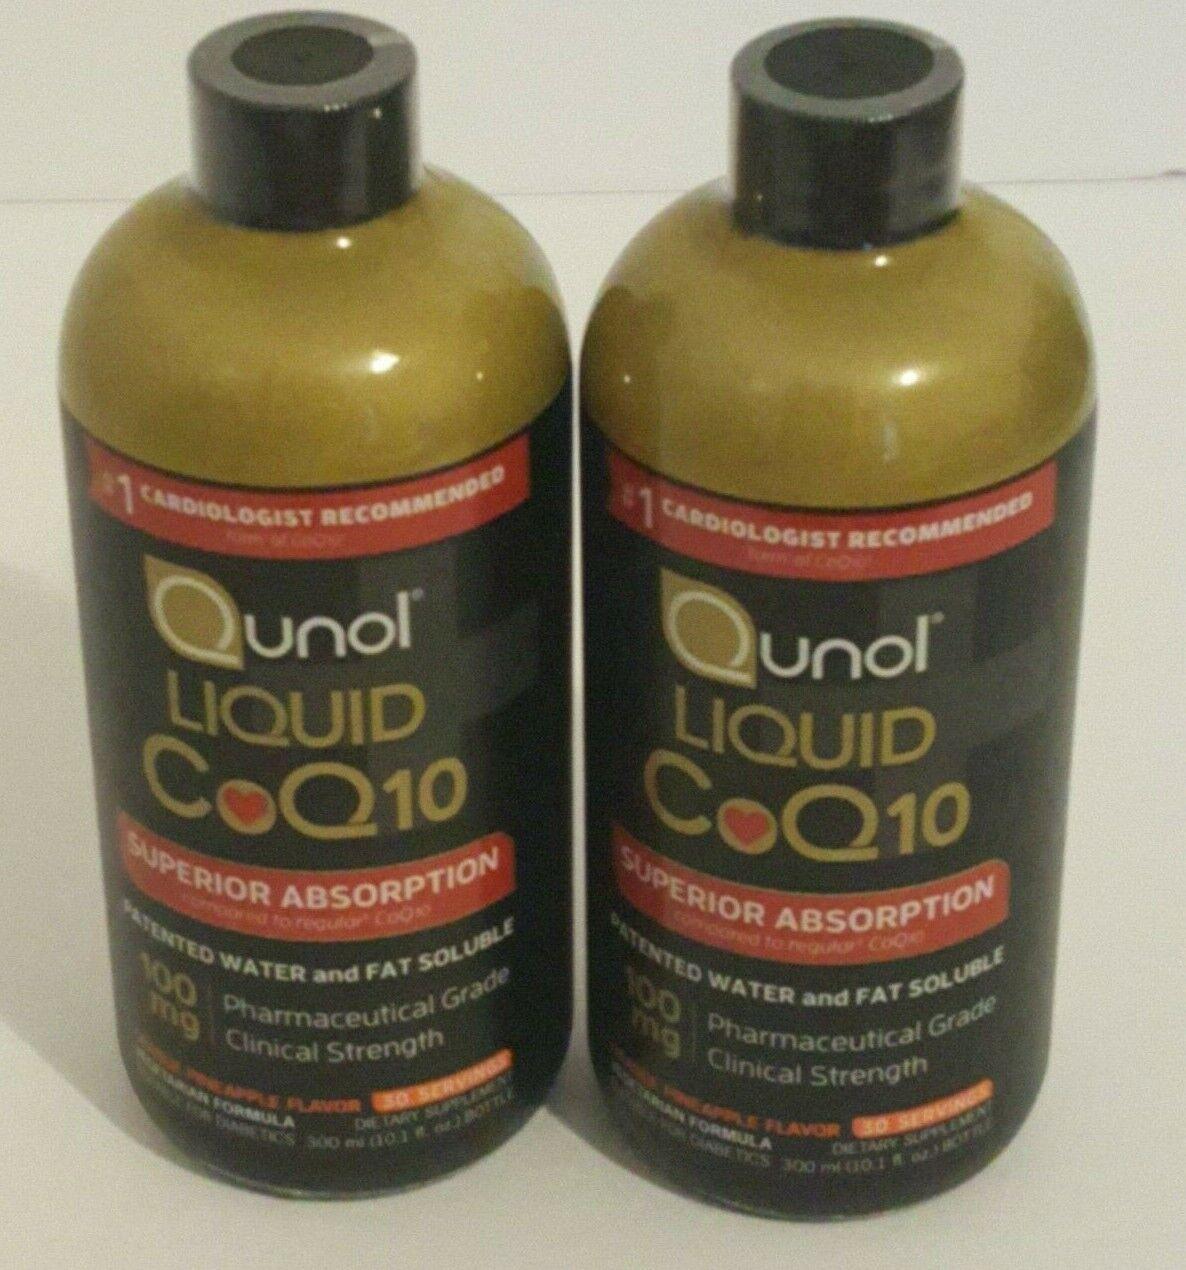 liquid coq10 100mg supplement superior absorption orange